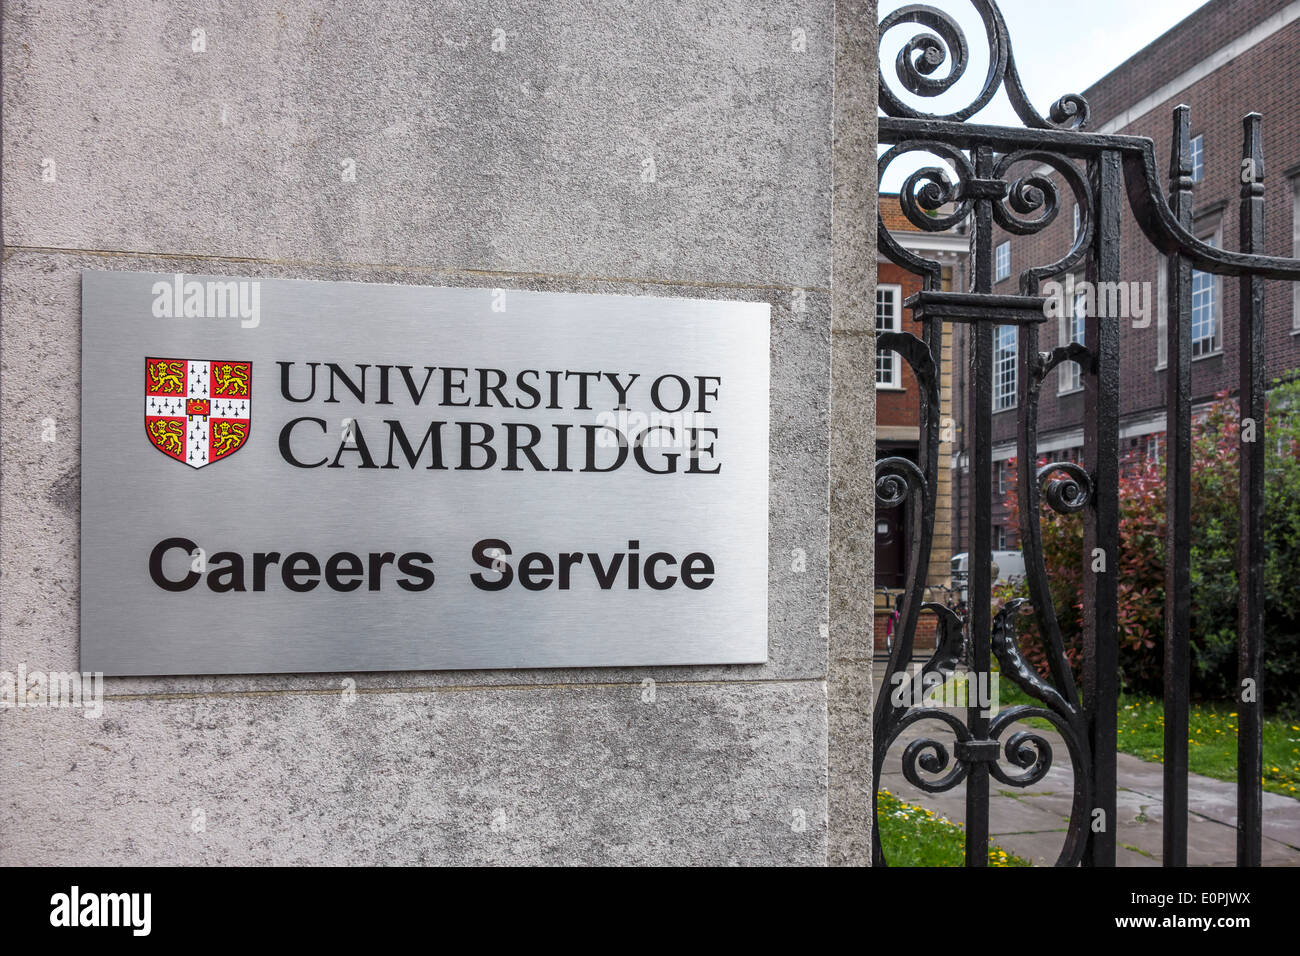 University of Cambridge Careers Service - Stock Image